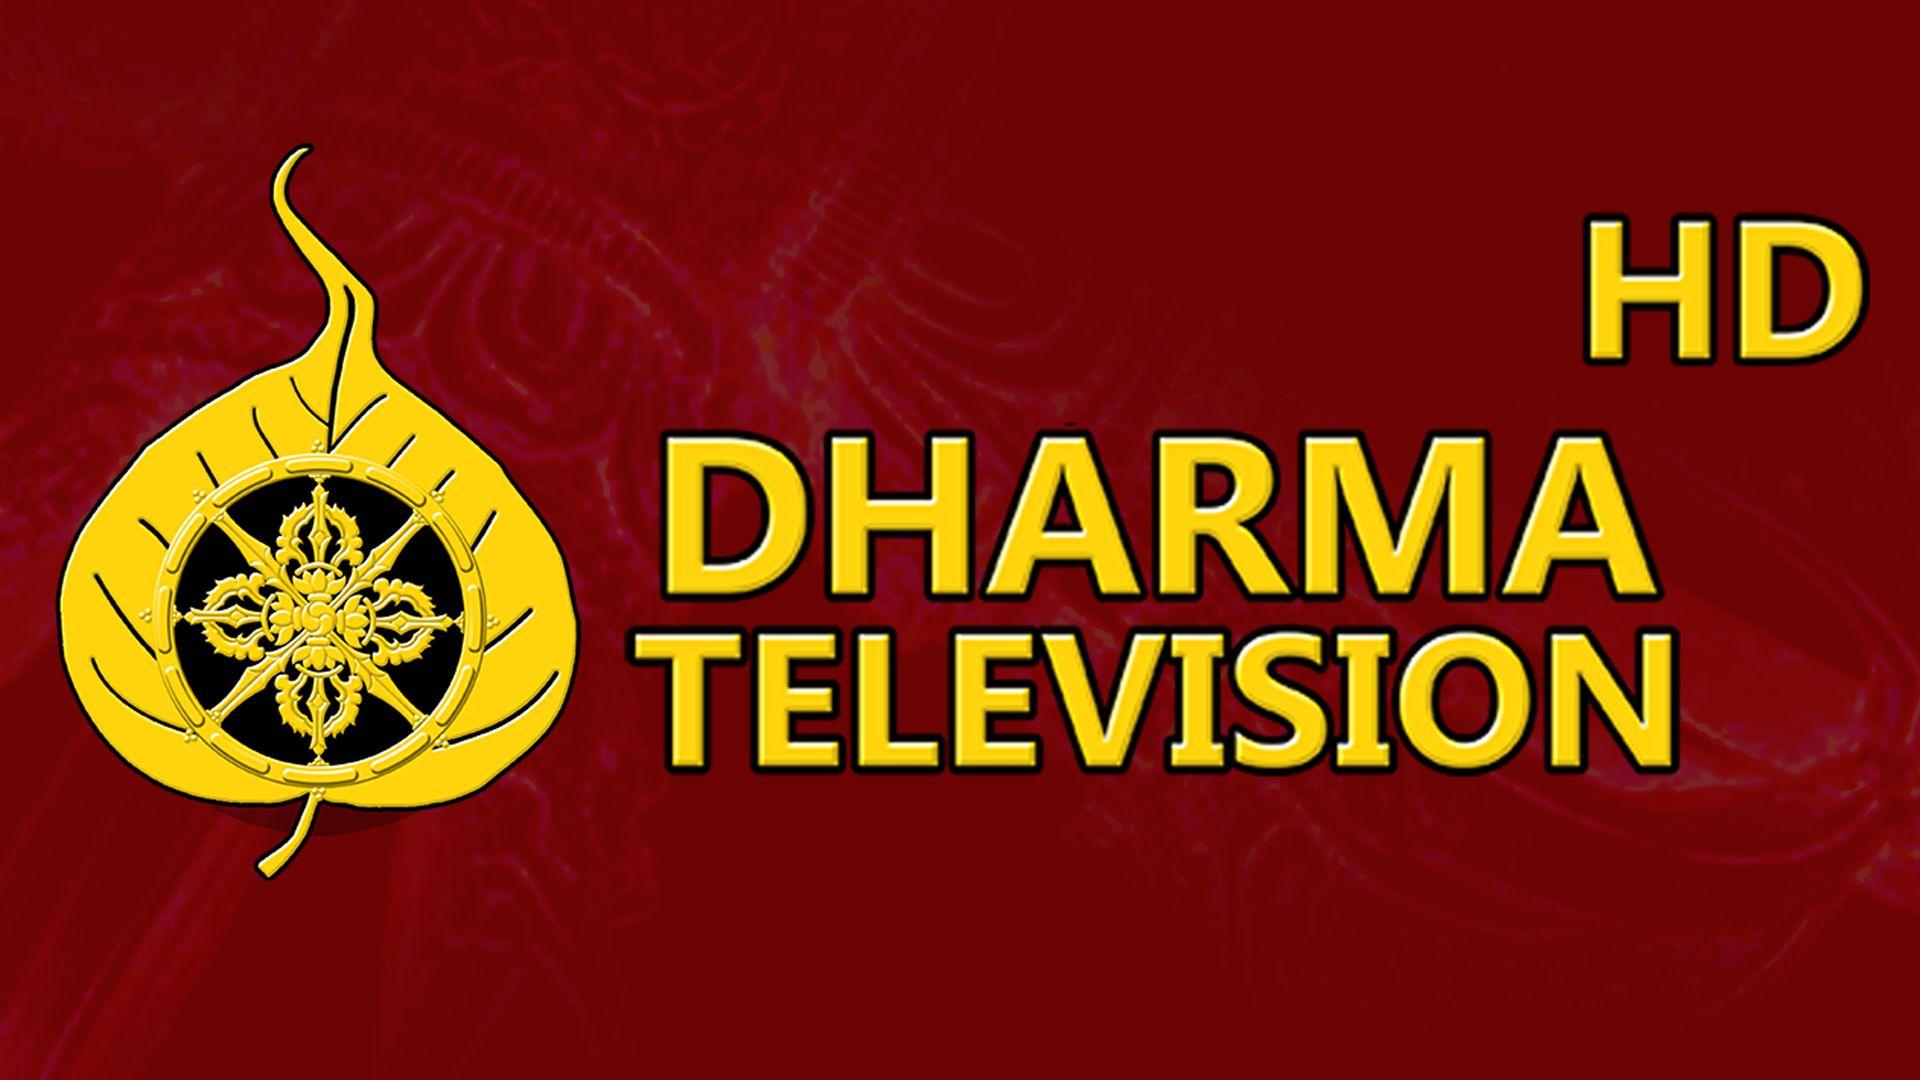 Dharma Television